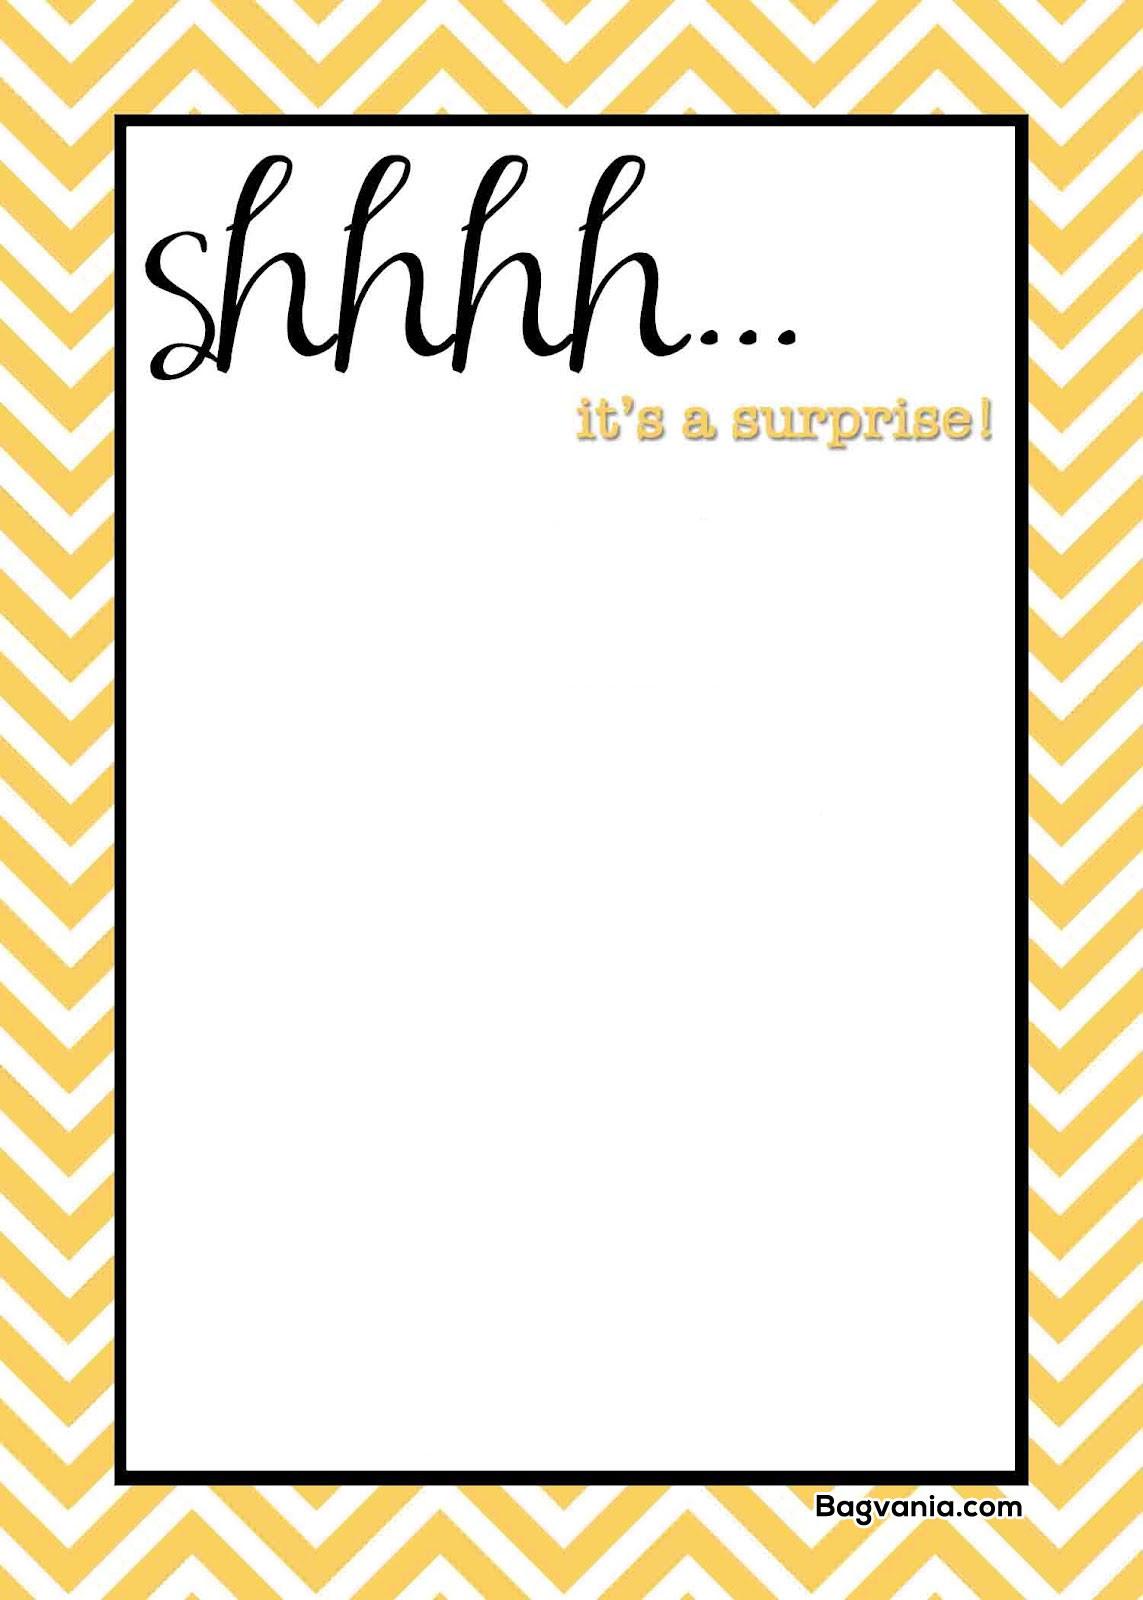 Free Templates For Birthday Invitations  Free Printable Surprise Birthday Invitations – FREE